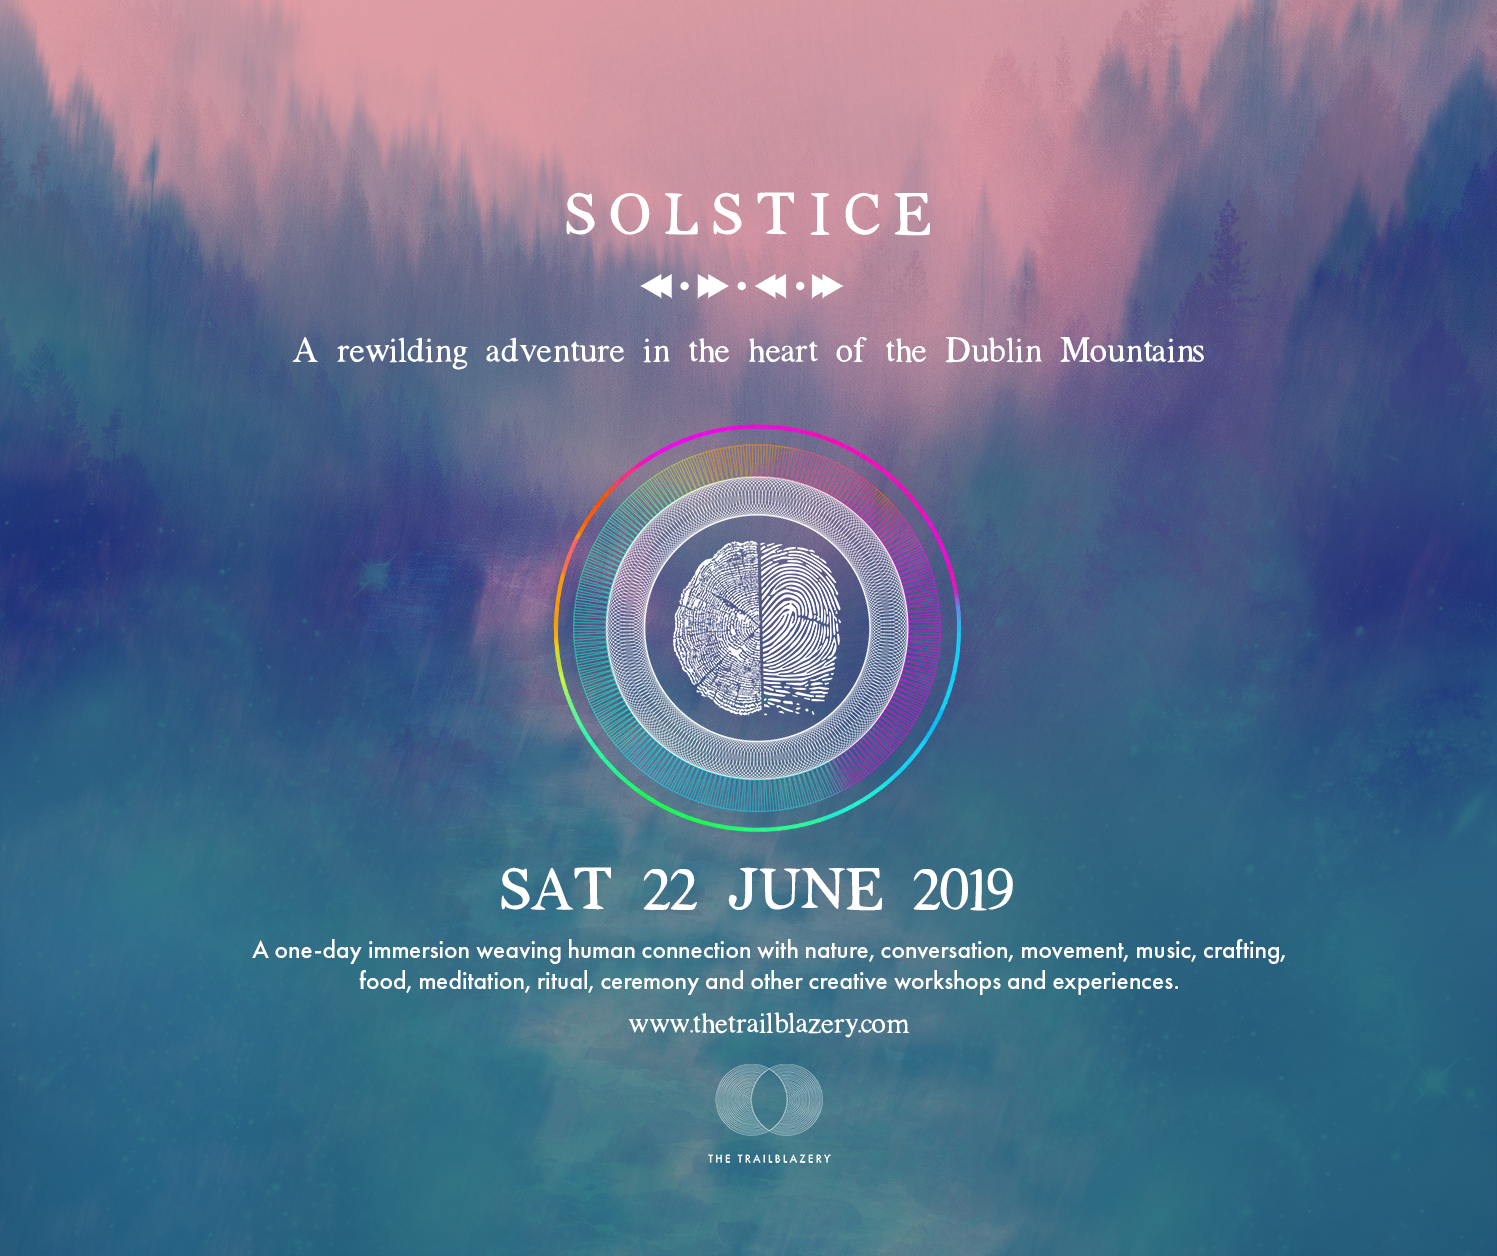 solstice-facebook (2).jpg